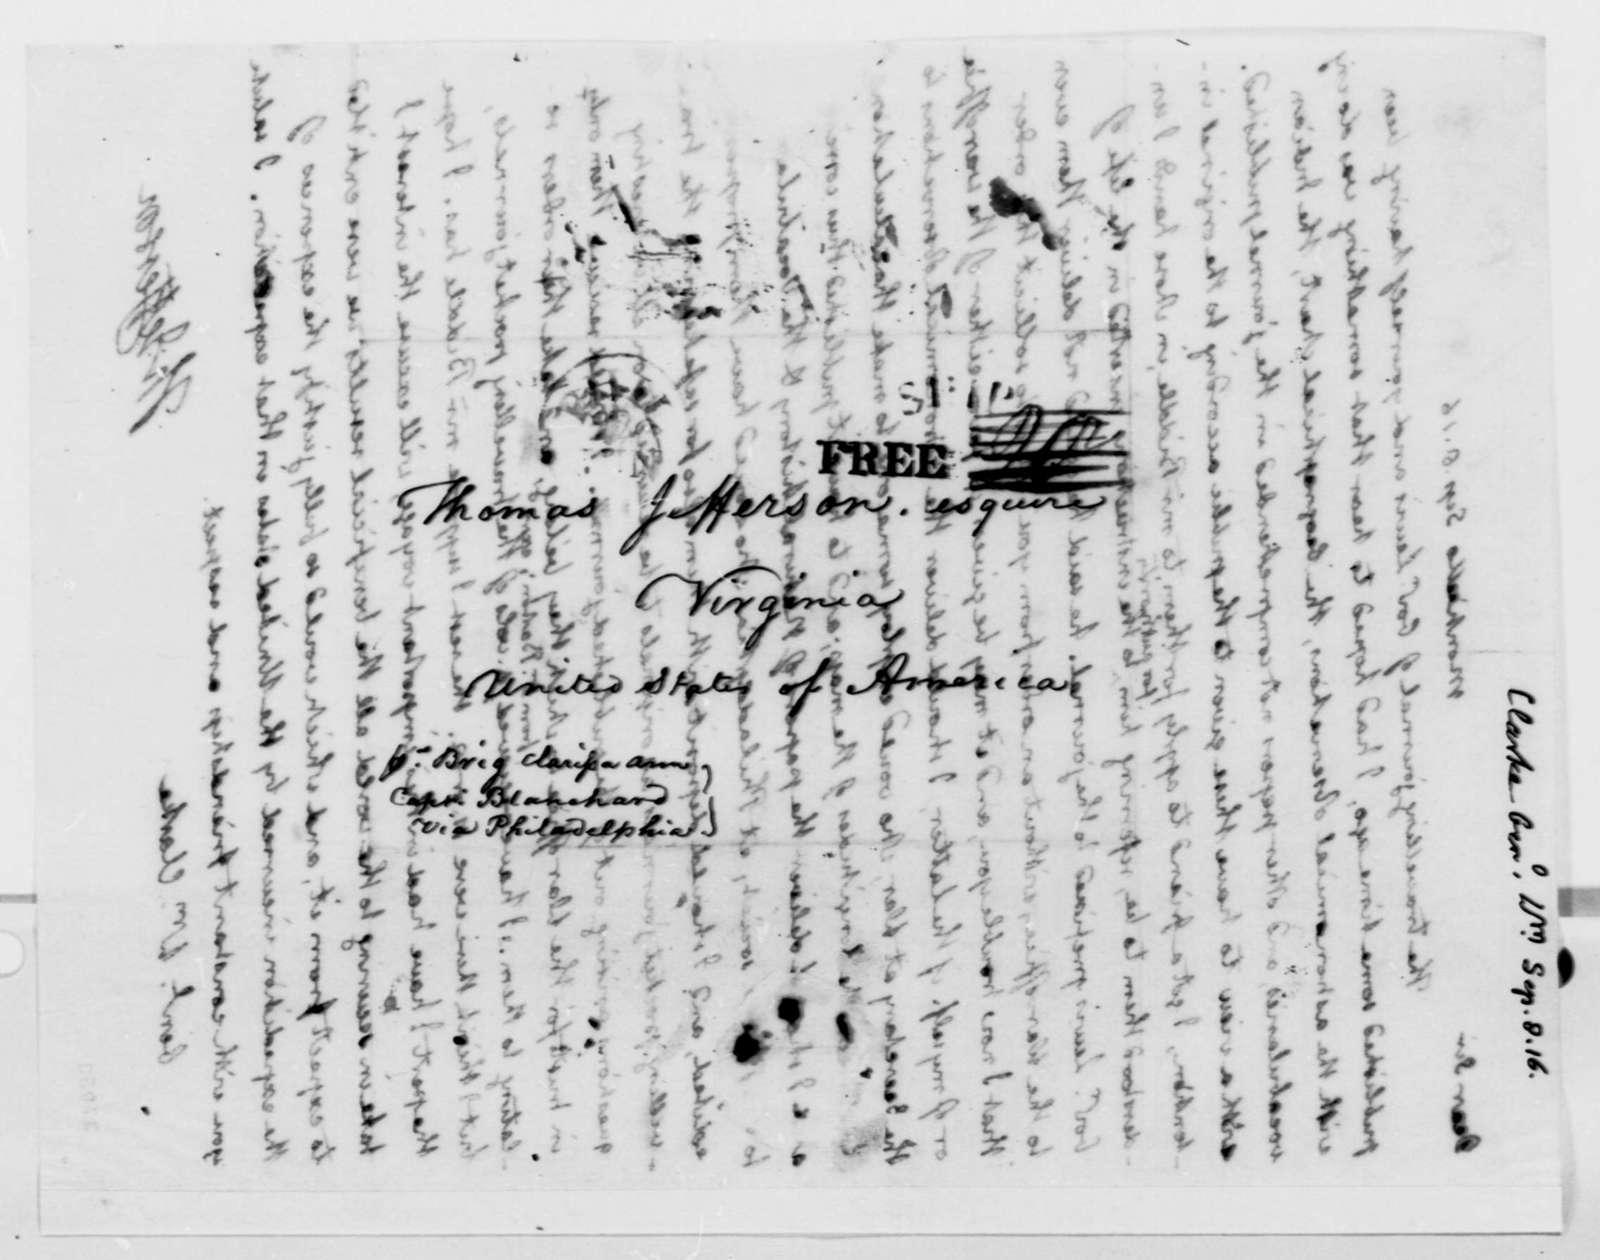 Thomas Jefferson to William Clark, September 8, 1816